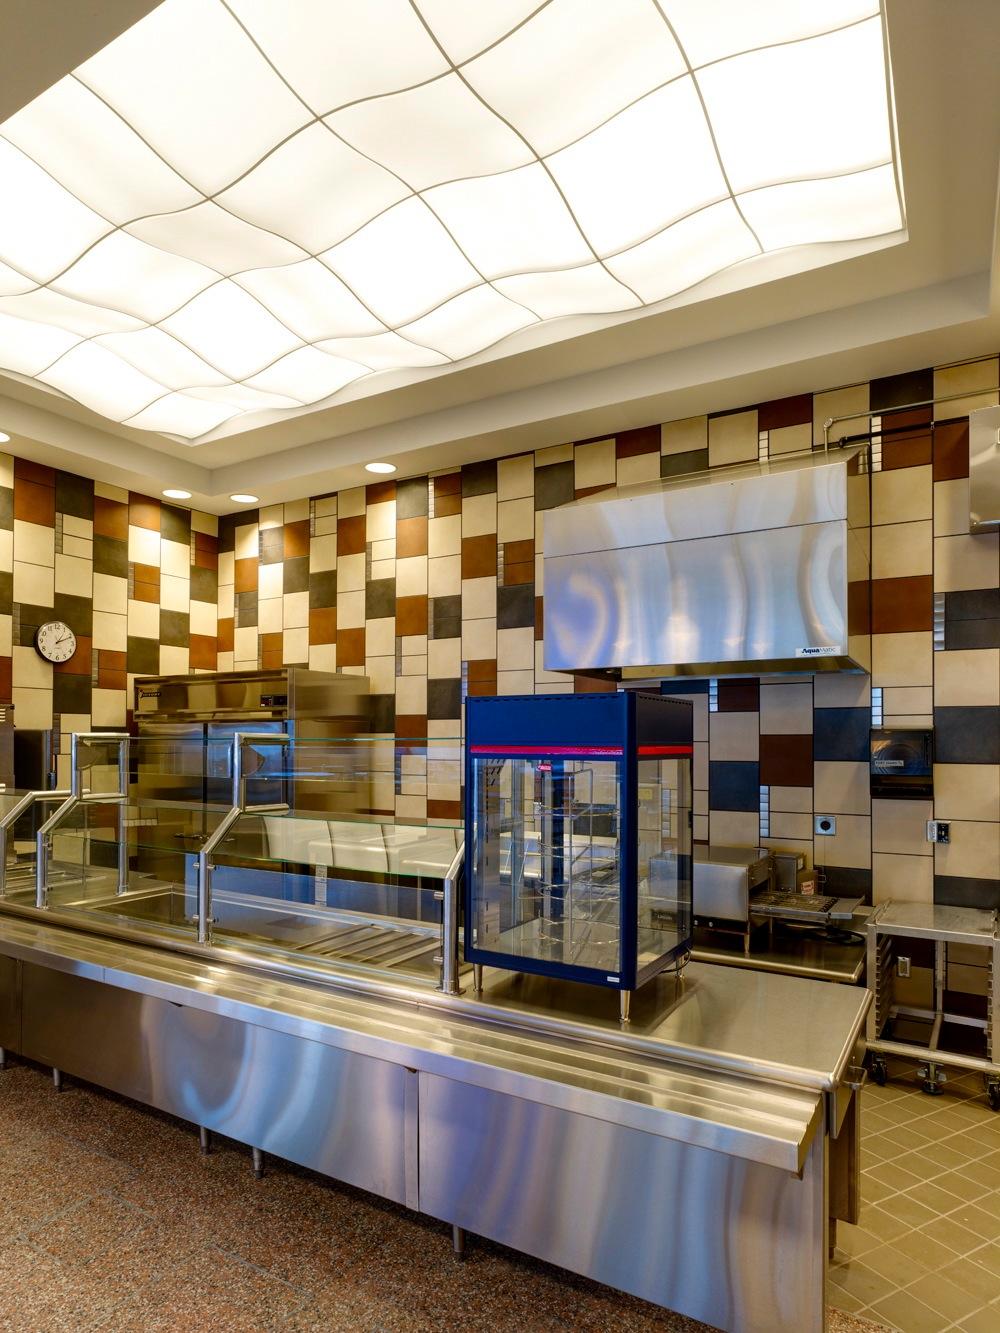 Howard Diner Hamilton College Joseph Flihan Co